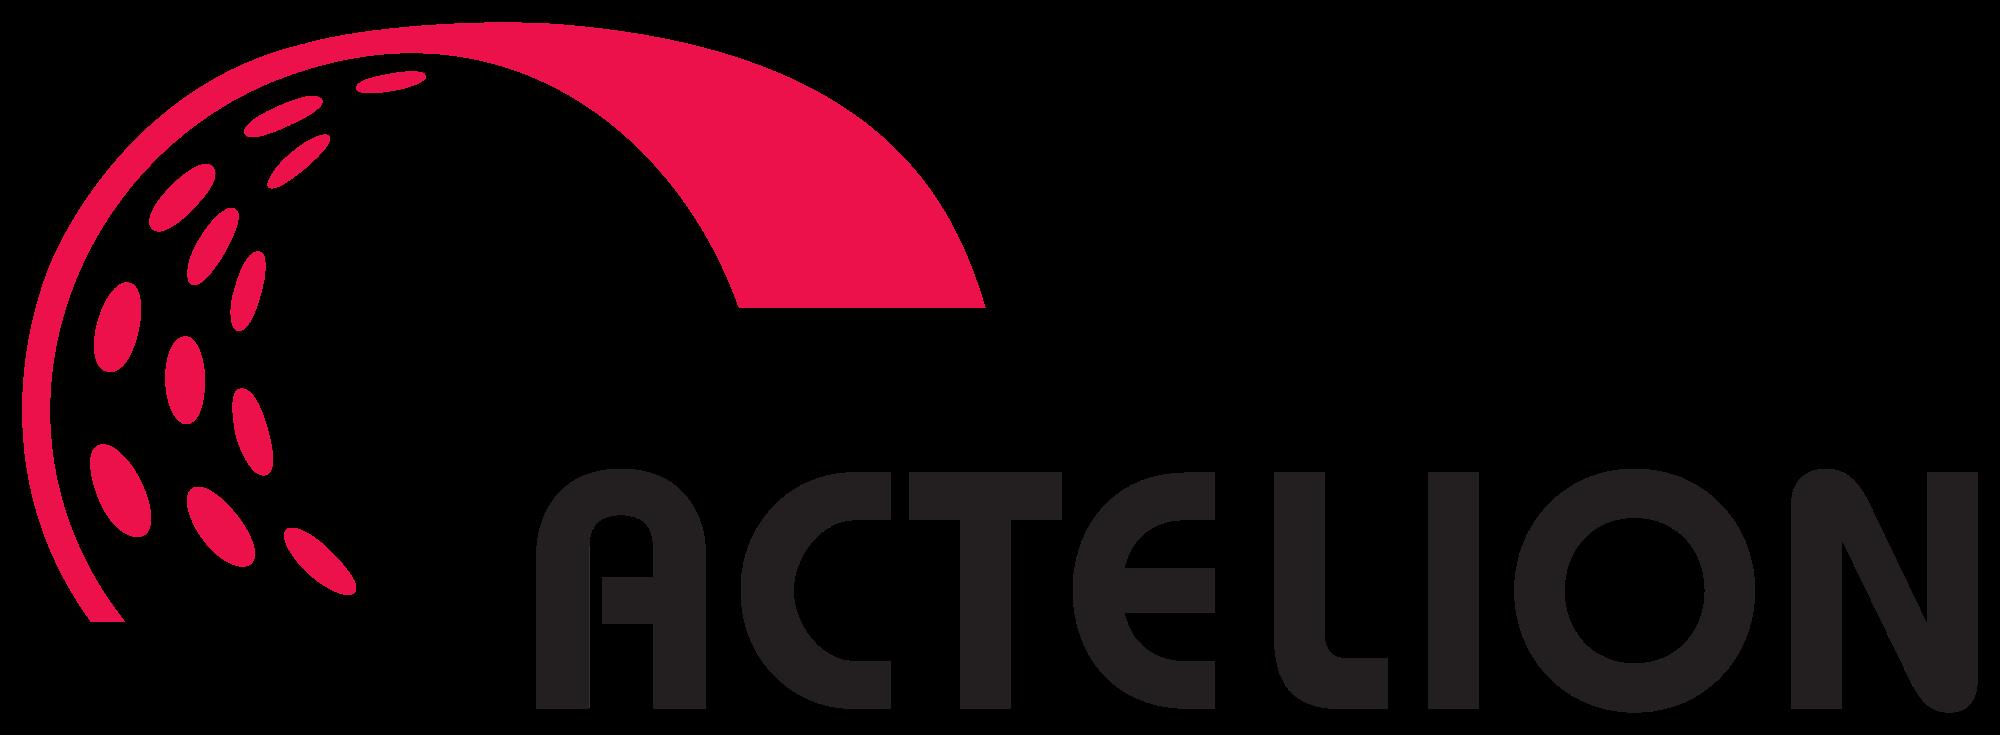 «Актелион фармасьютикалс» (Actelion Pharmaceuticals).